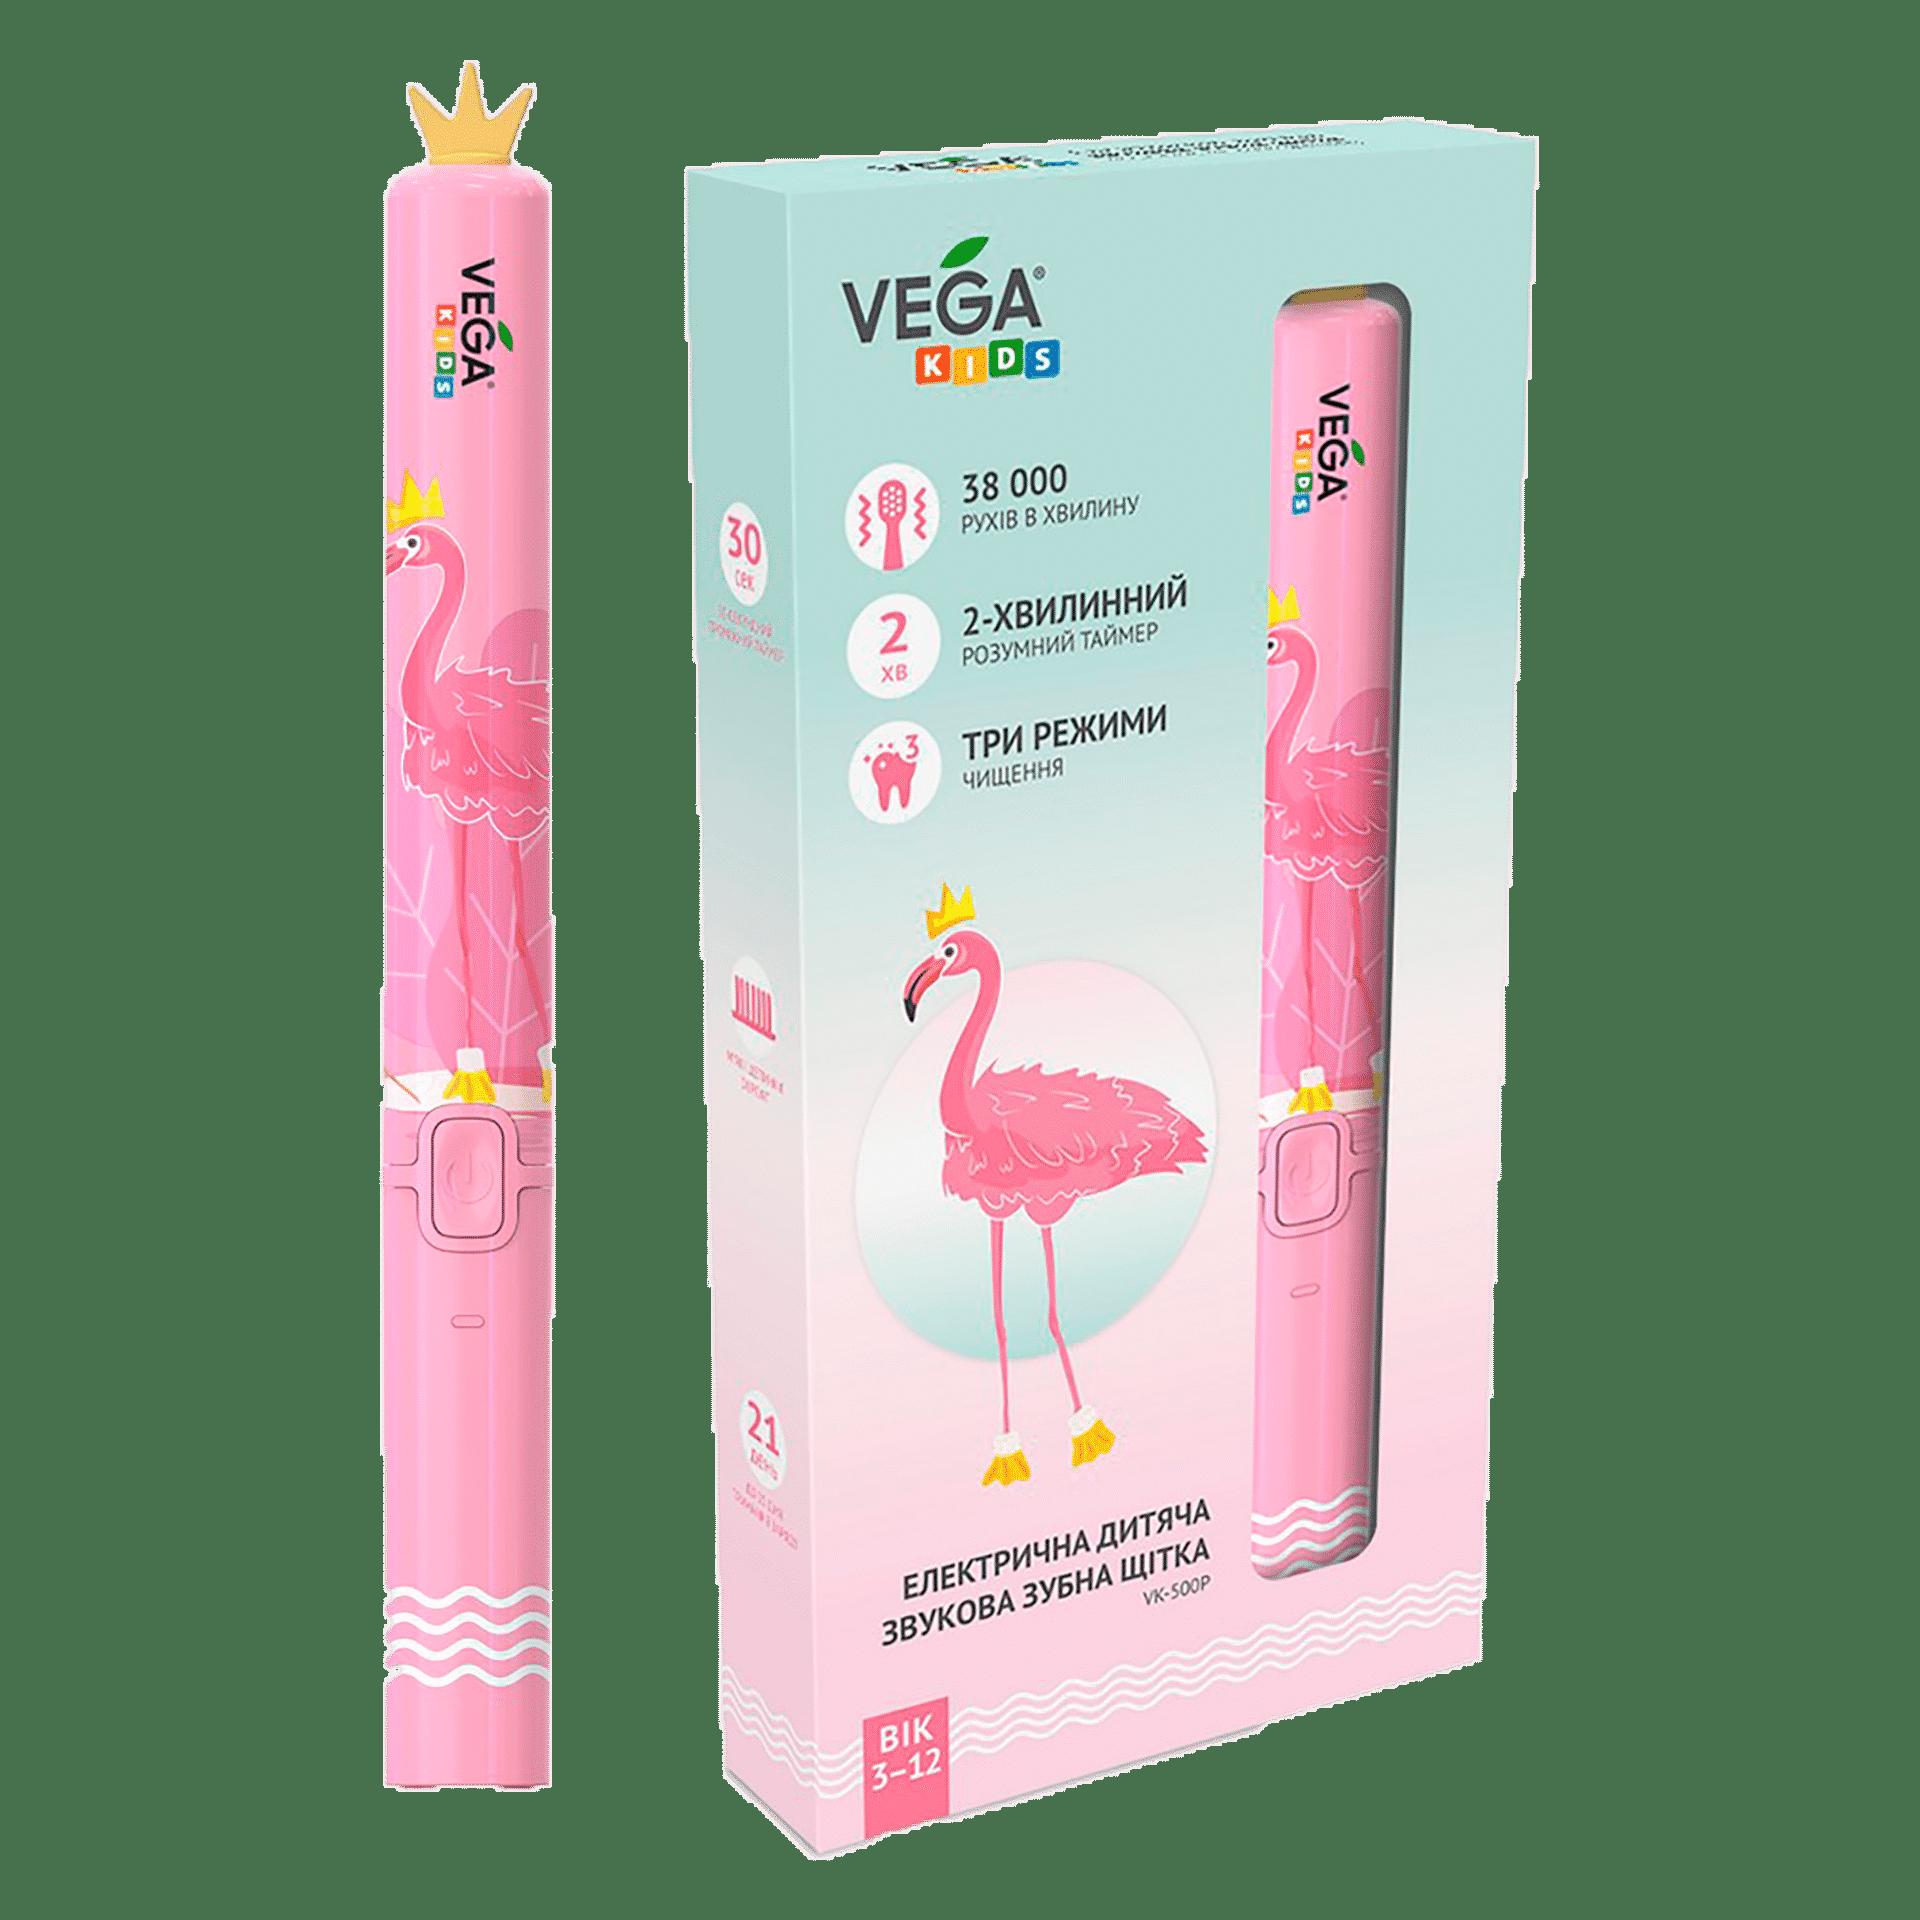 Електрична дитяча звукова зубна щітка Vega Kids VK-500B (рожева)